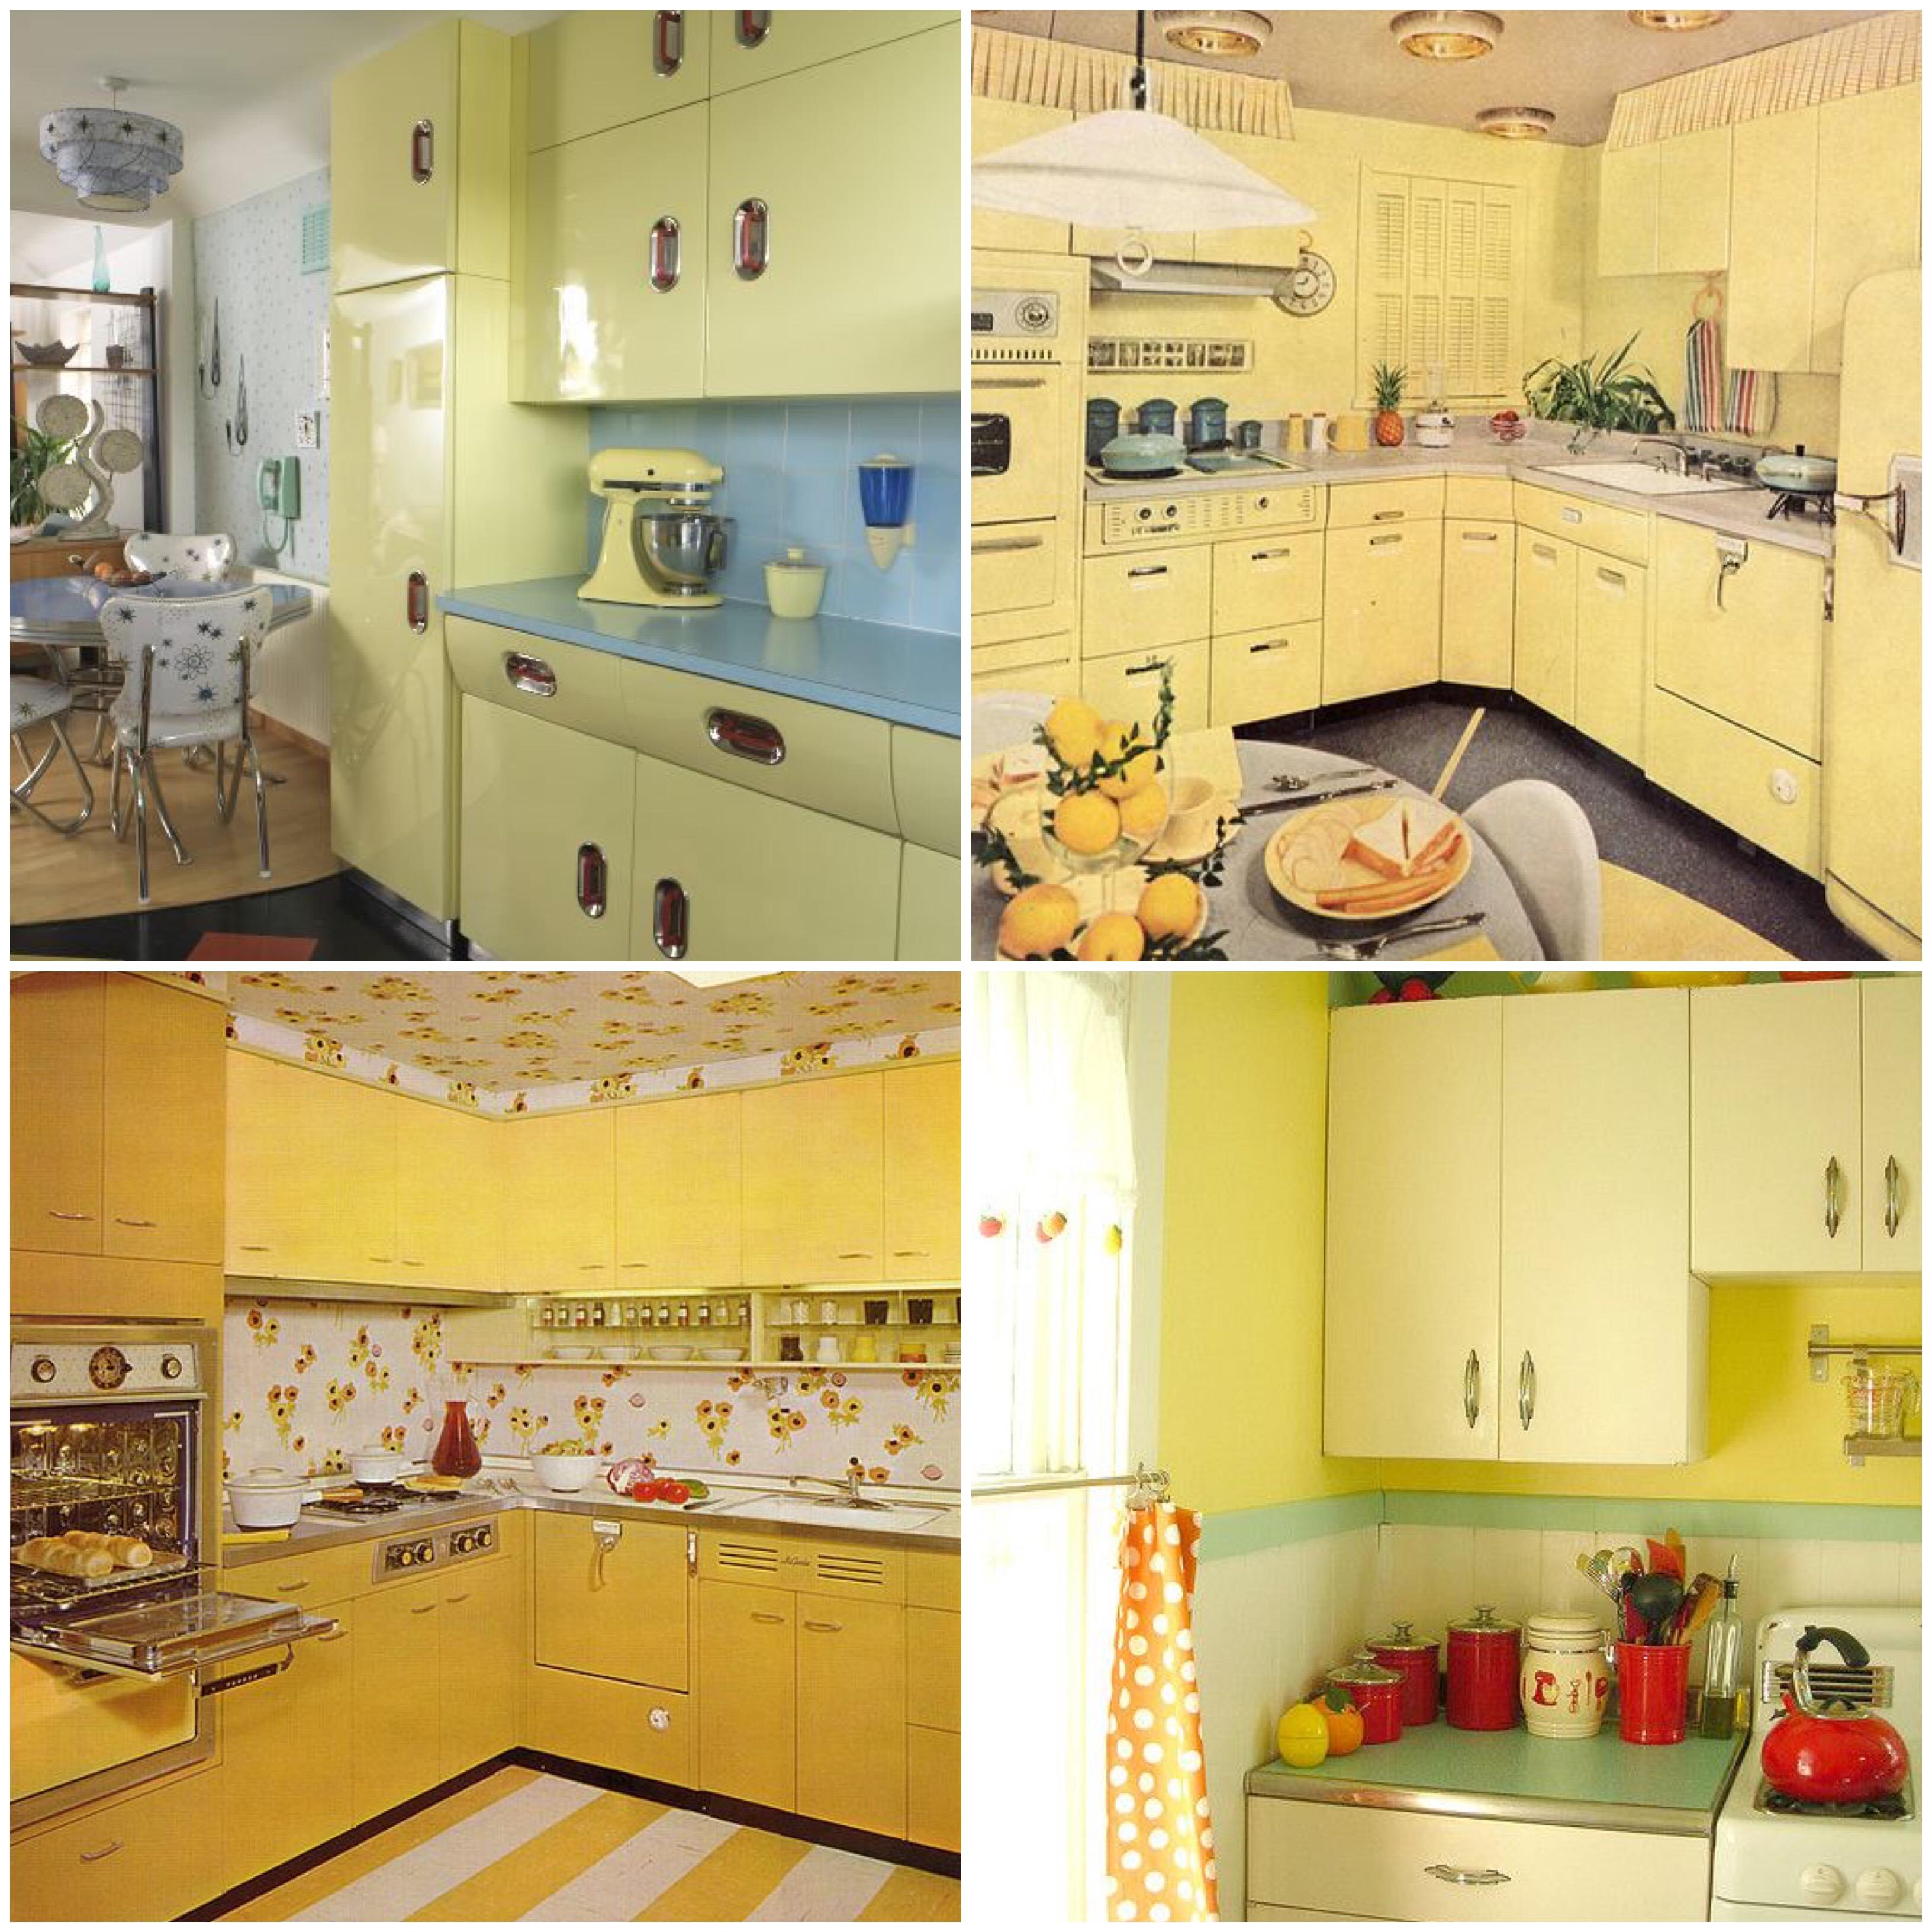 yellow kitchen appliances 7 piece table set taste the rainbow vintage kitchens of every shade